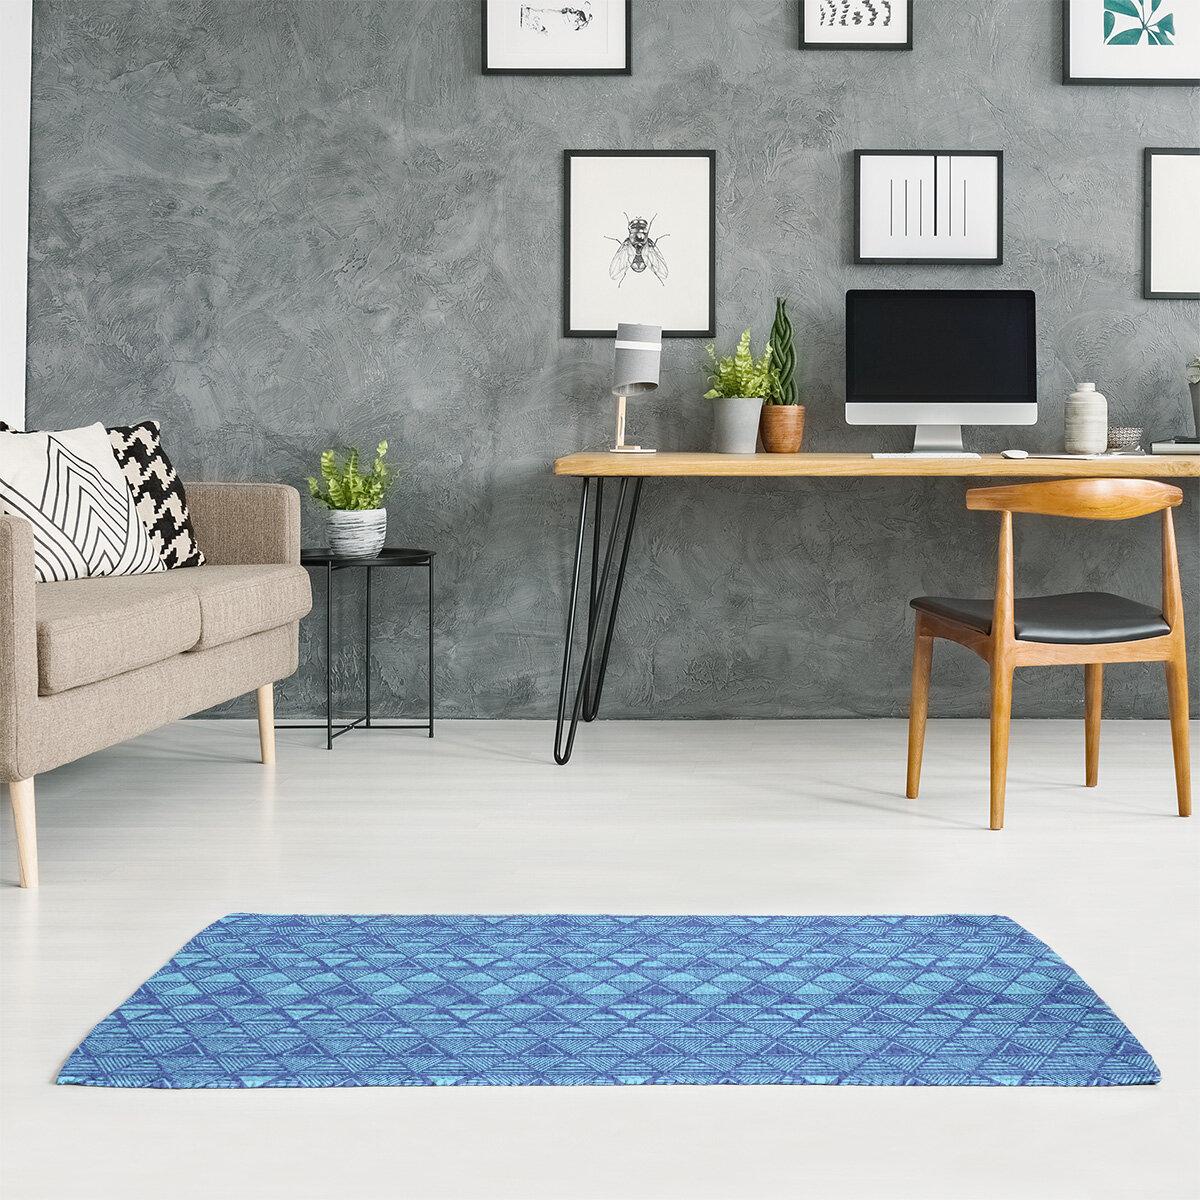 East Urban Home Hand Drawn Triangles Blue Area Rug Wayfair